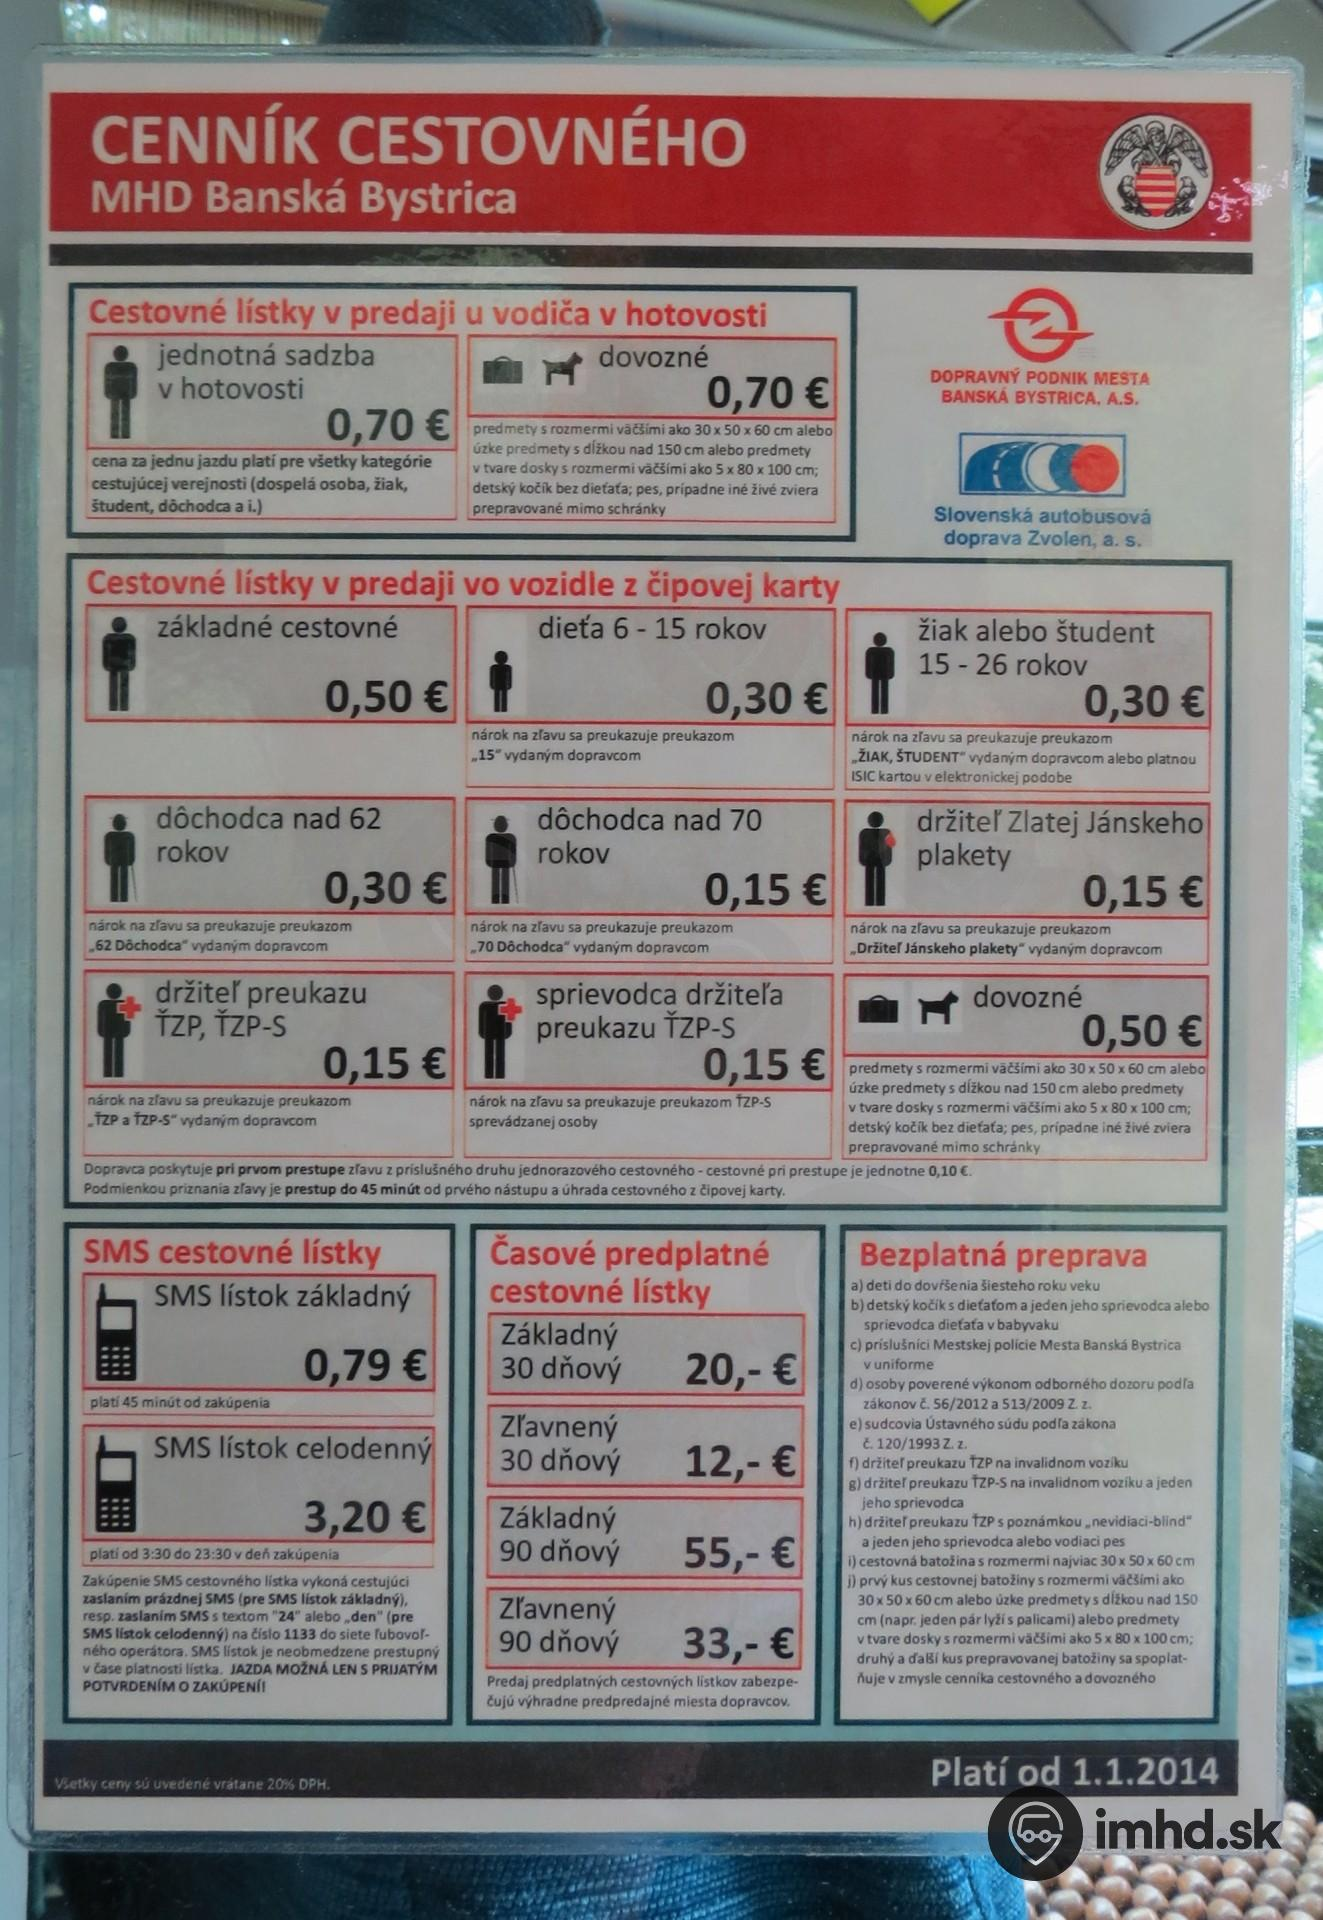 Informacie O Cenniku V Mhd Imhd Sk Banska Bystrica